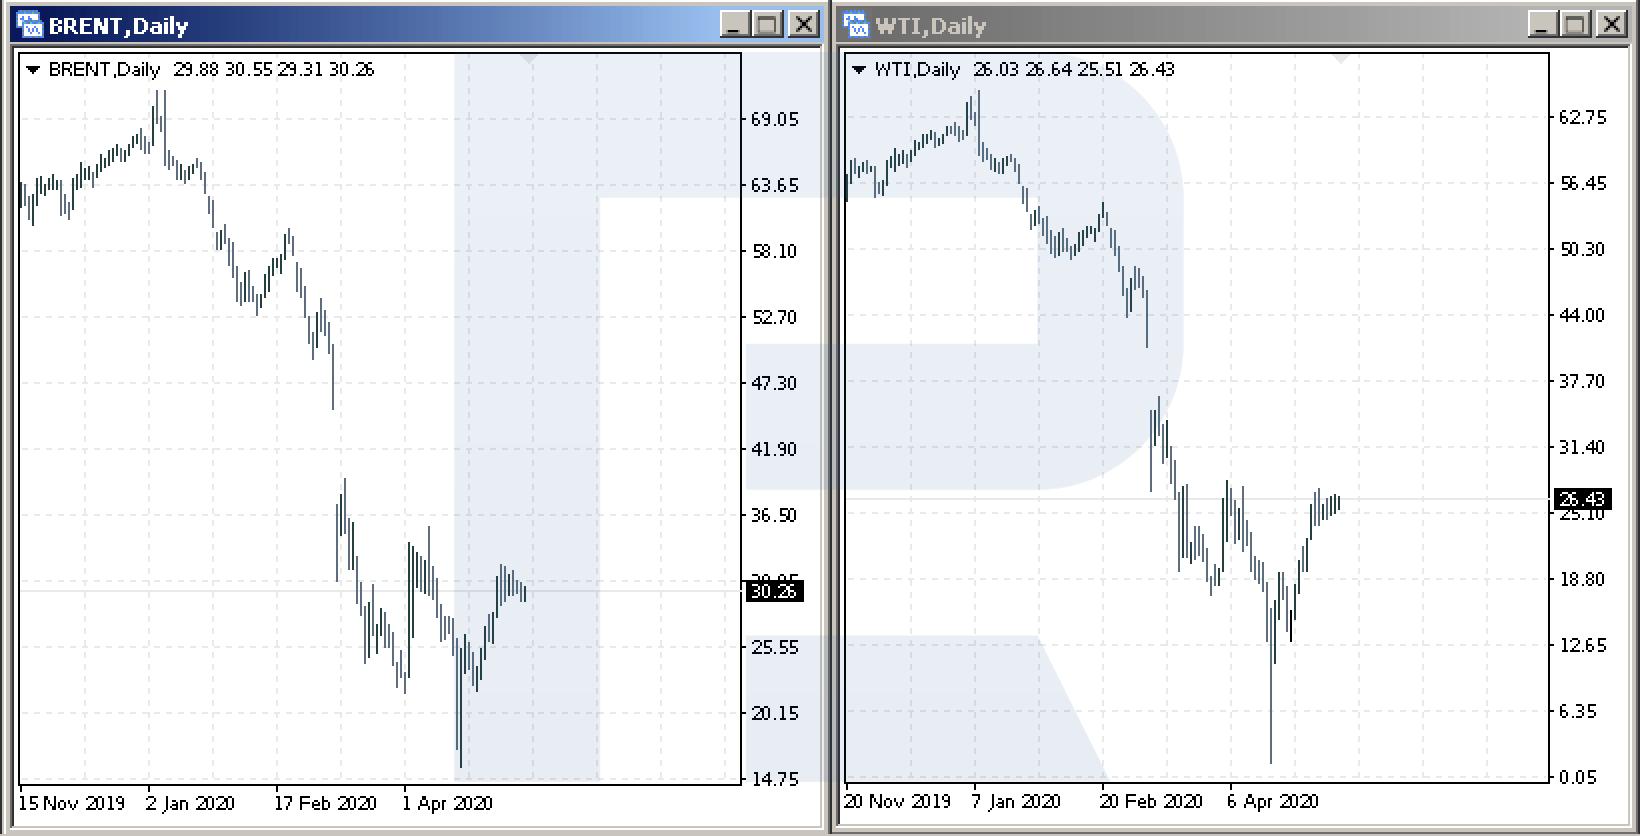 Stockpair terbaik pilihan binari sistem perdagangan automatik